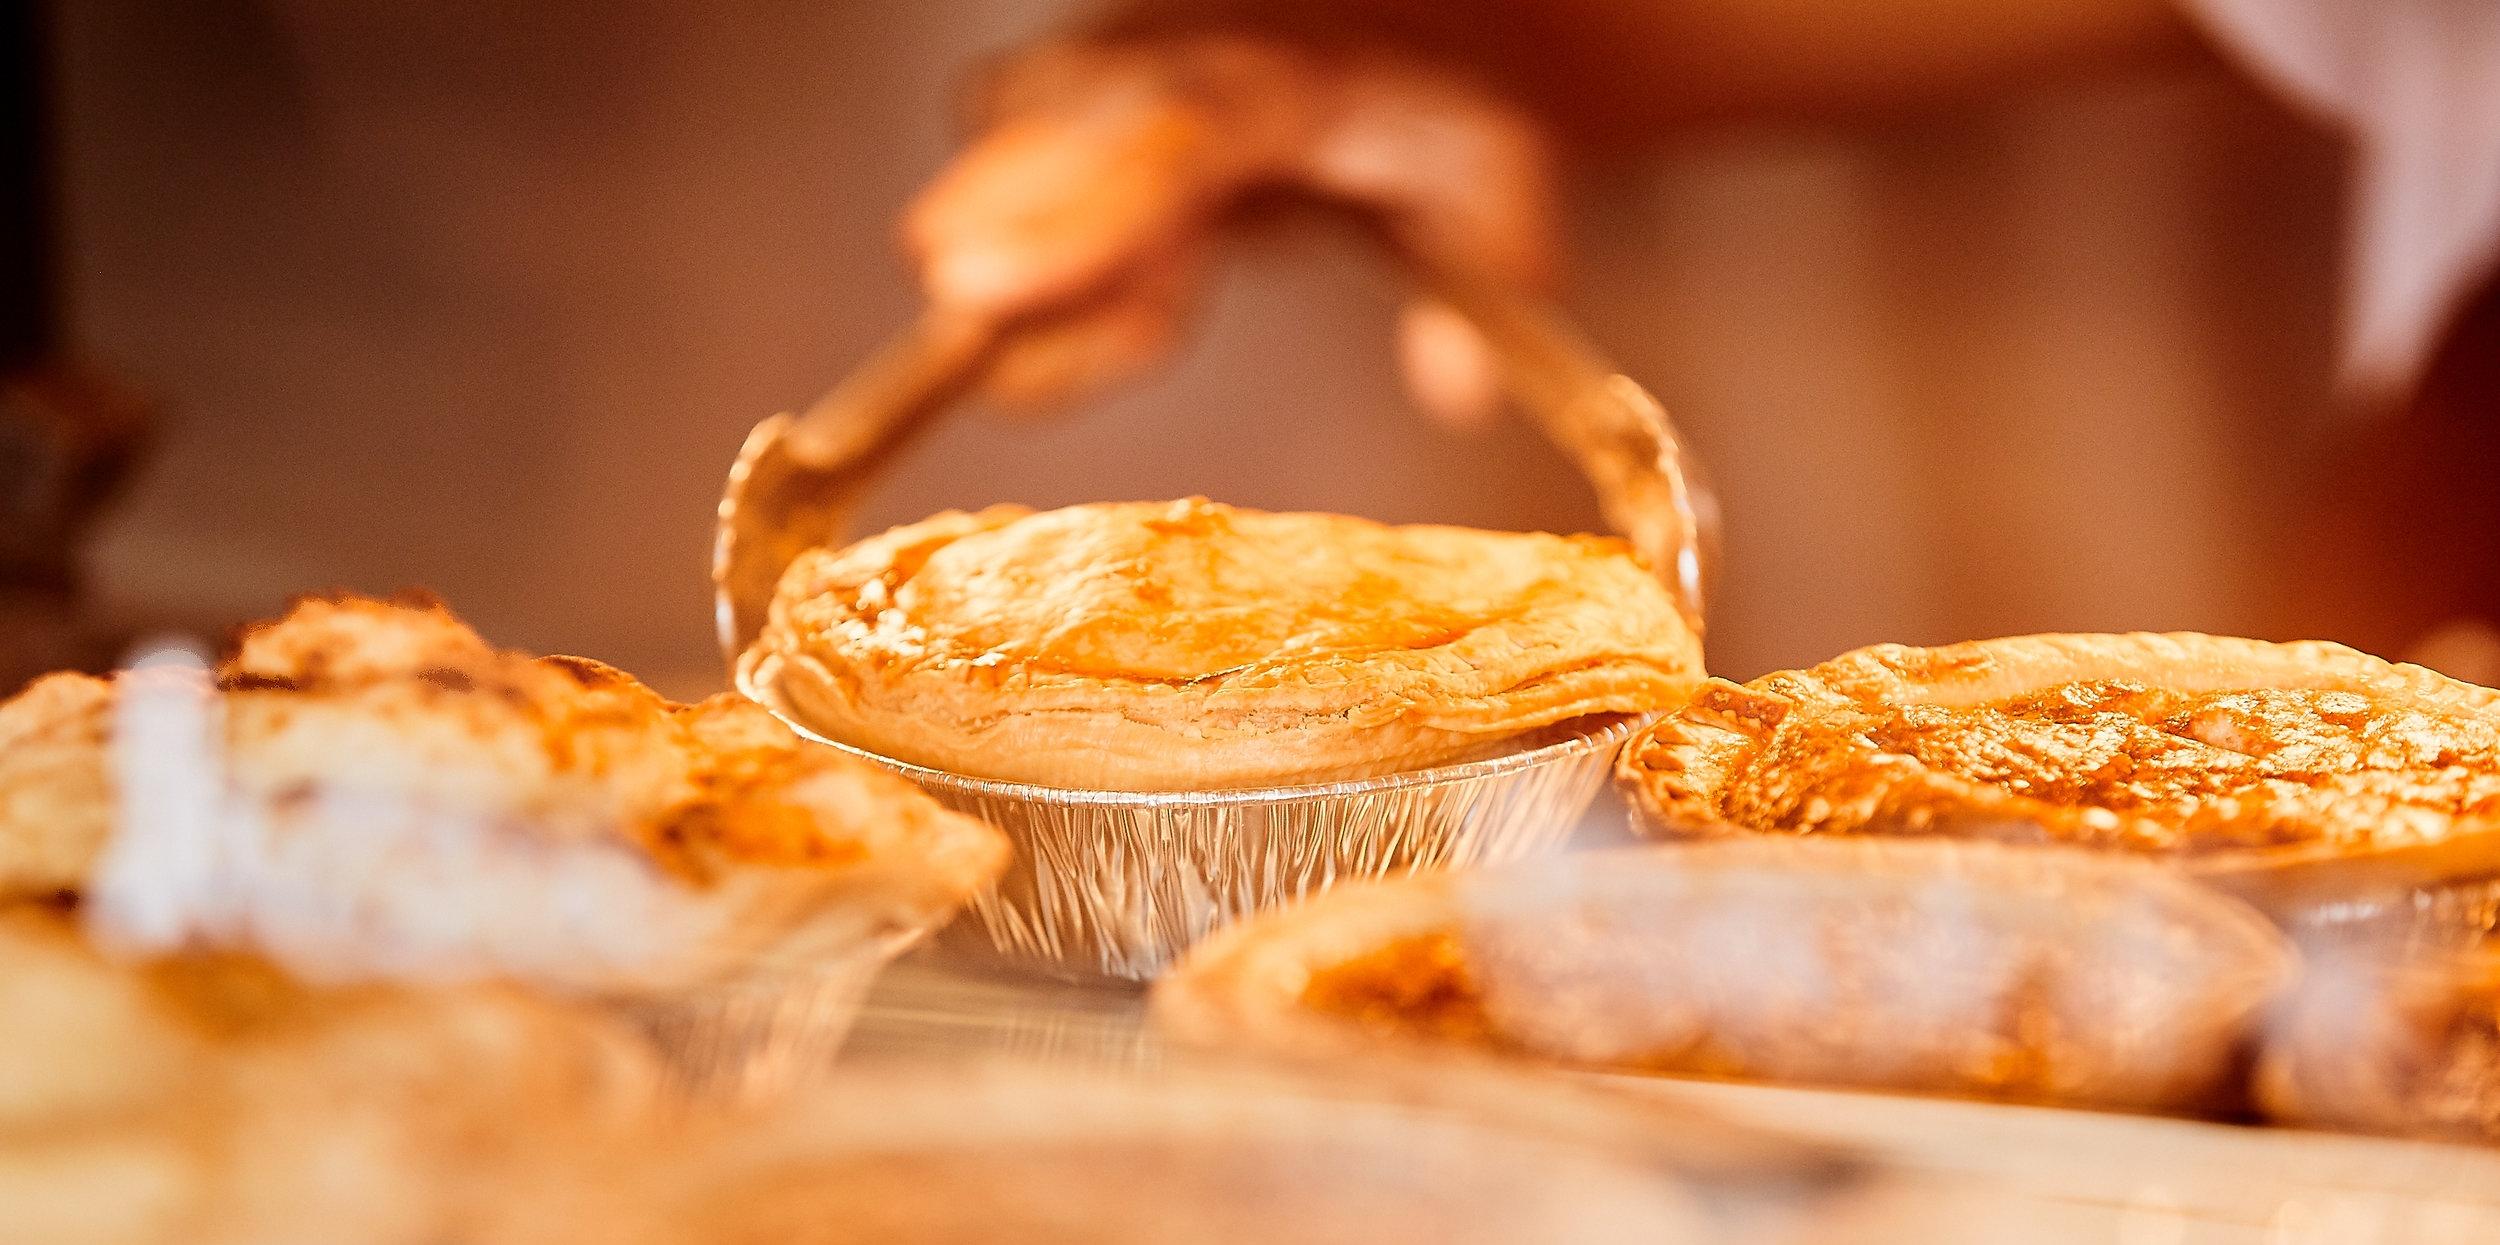 170622 Pie Not 0062